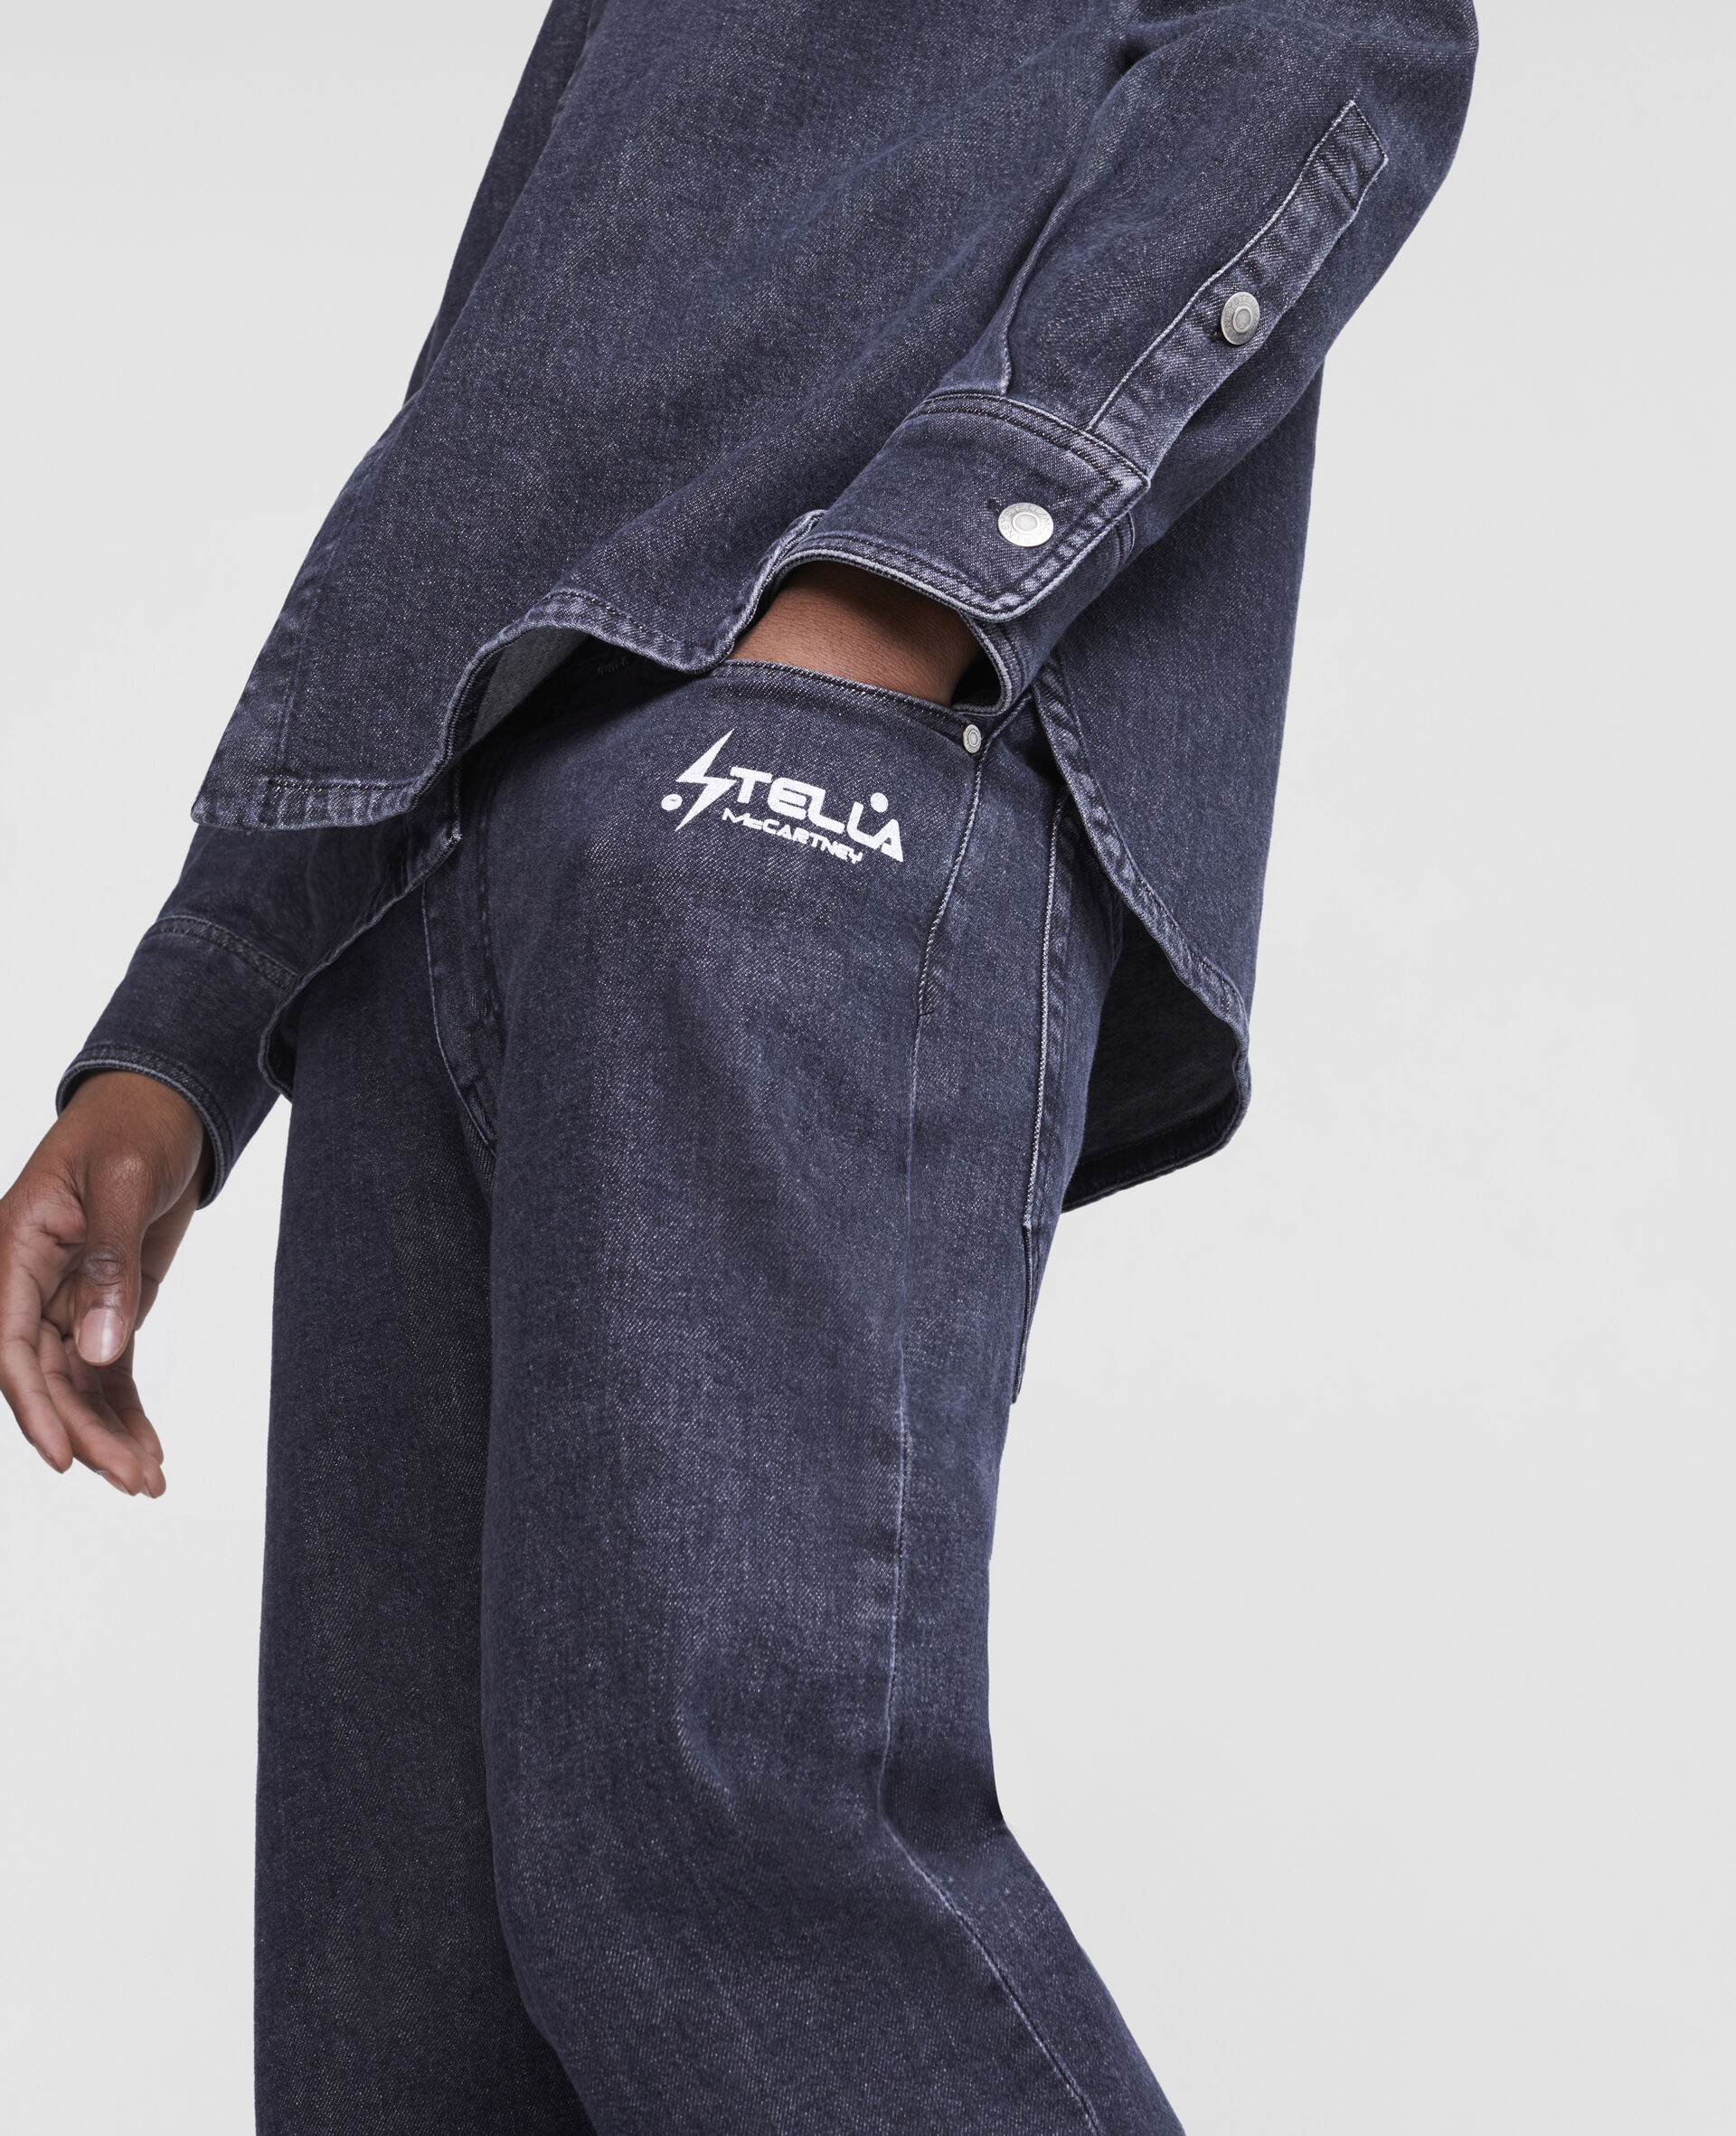 Jeans in Denim con Logo Stella Tom Tosseyn-Nero-large image number 4